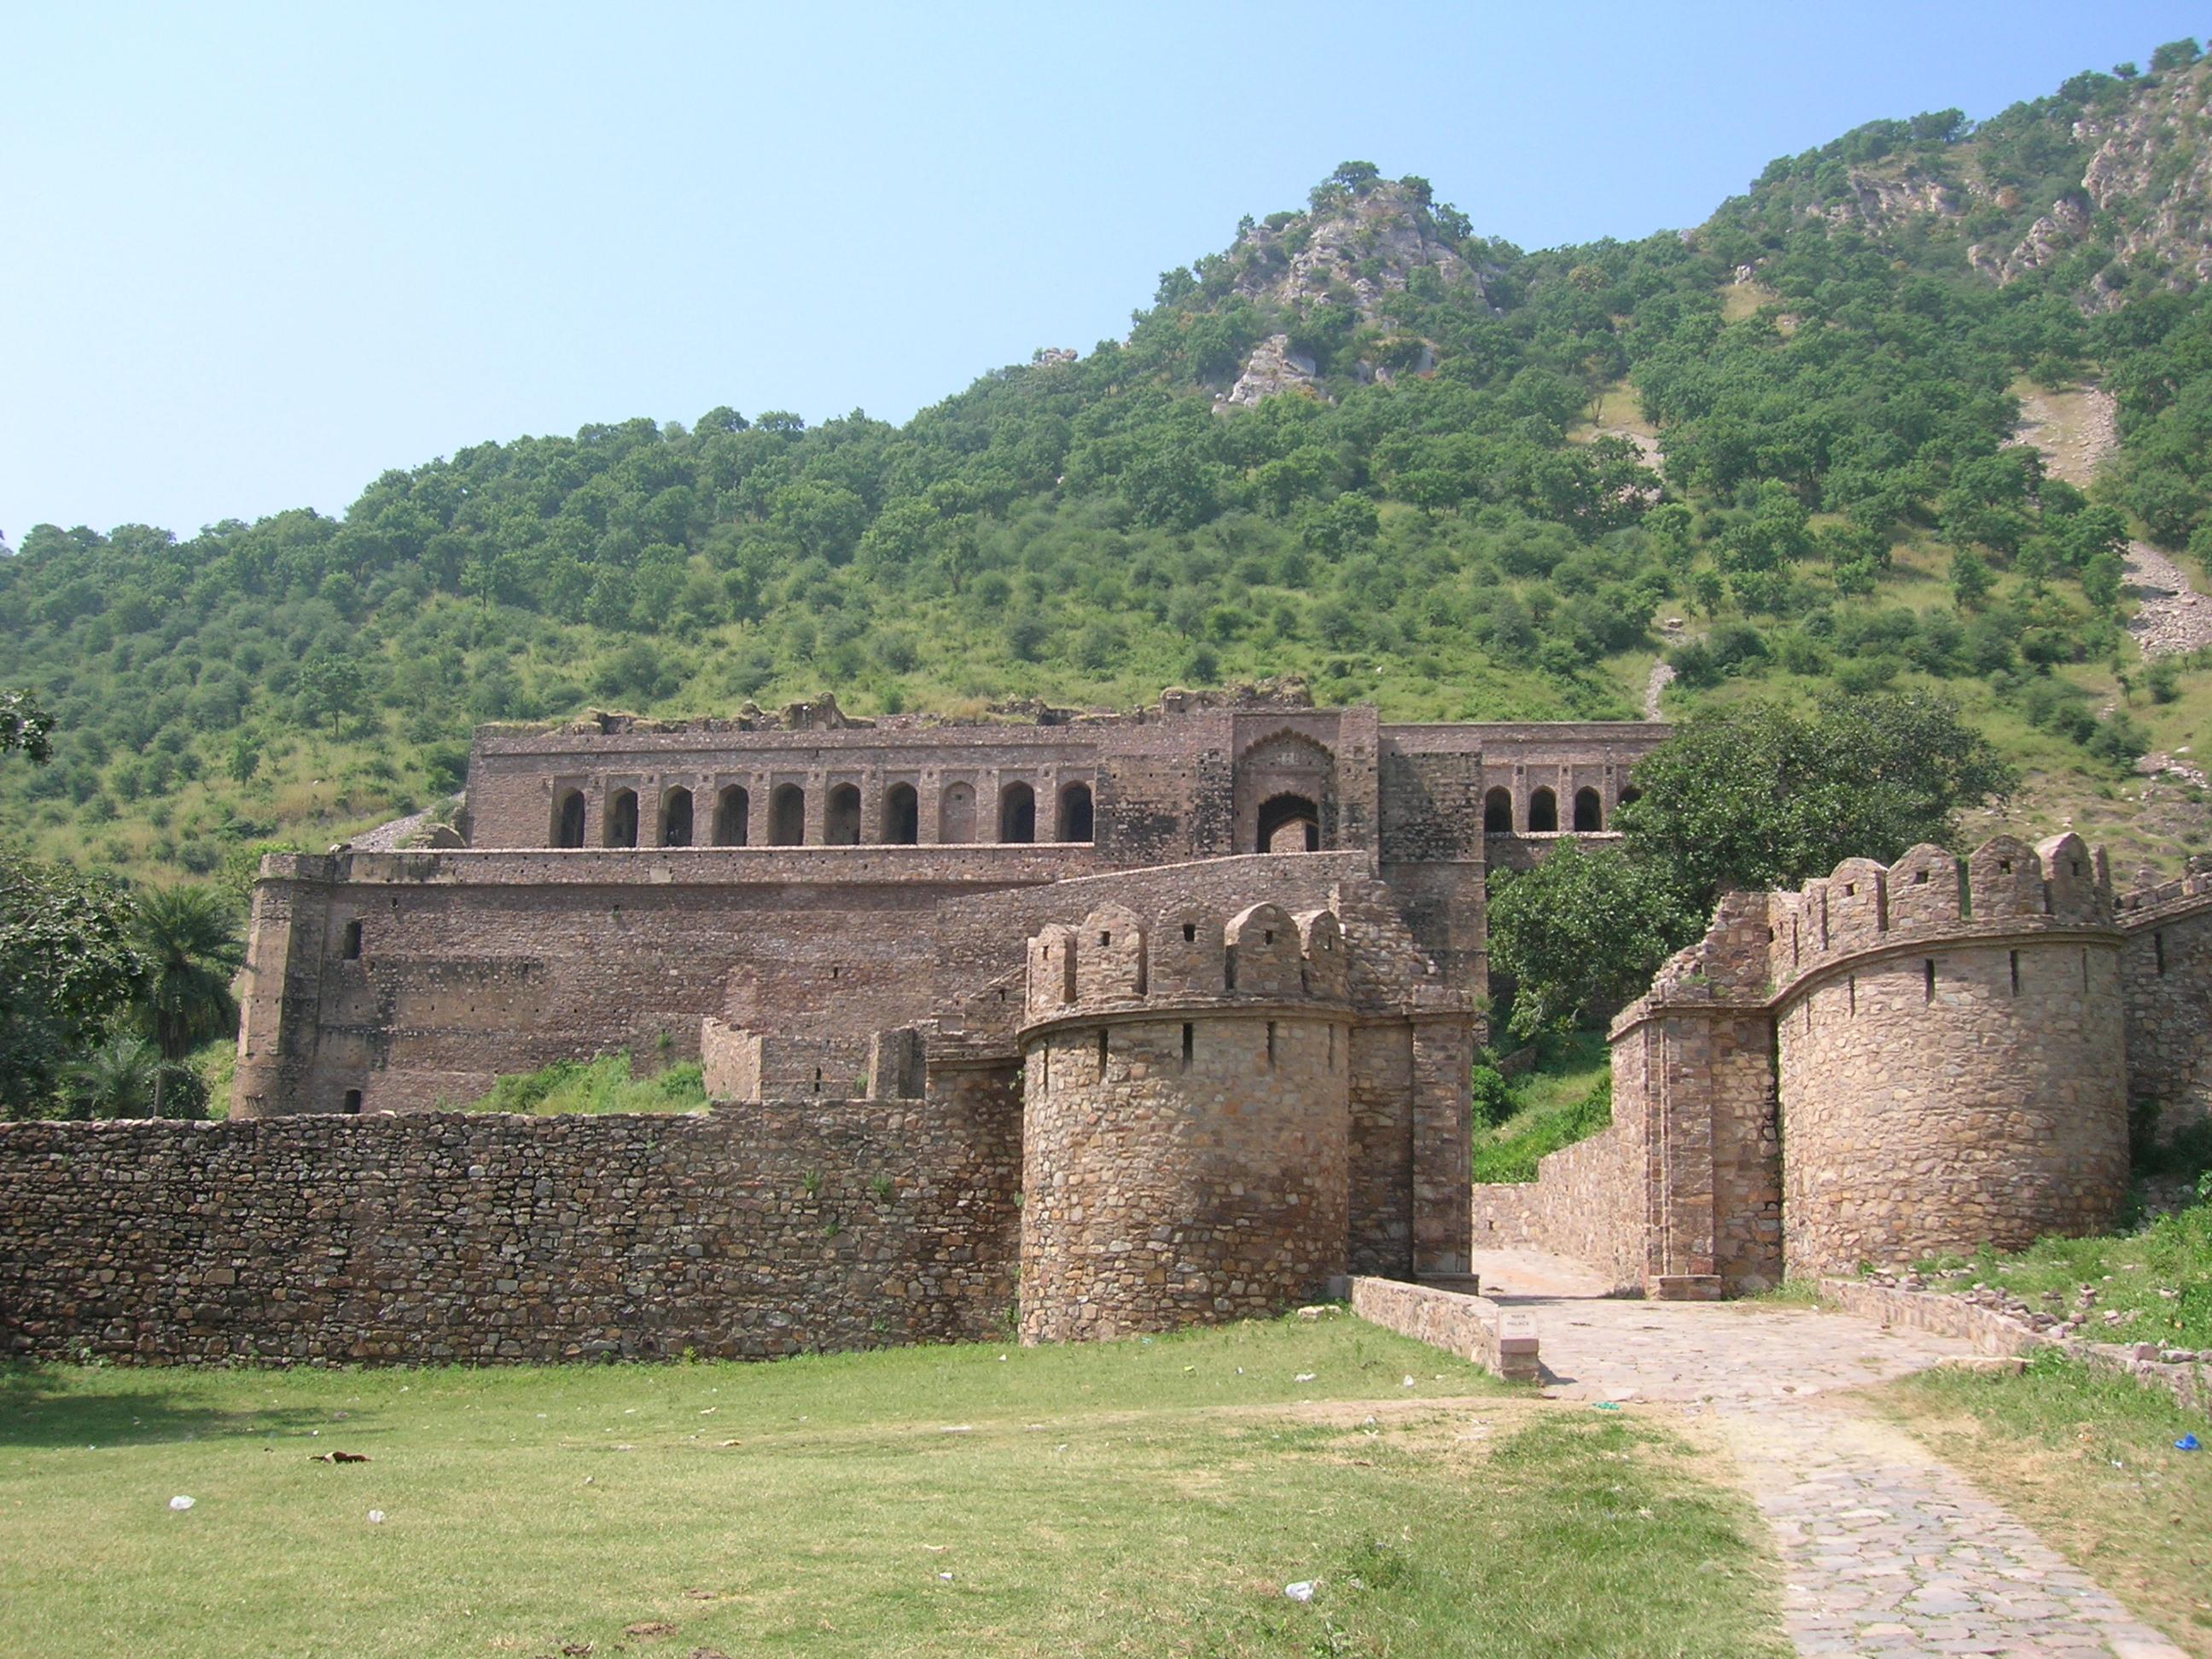 Bhangarh – Rajasthan